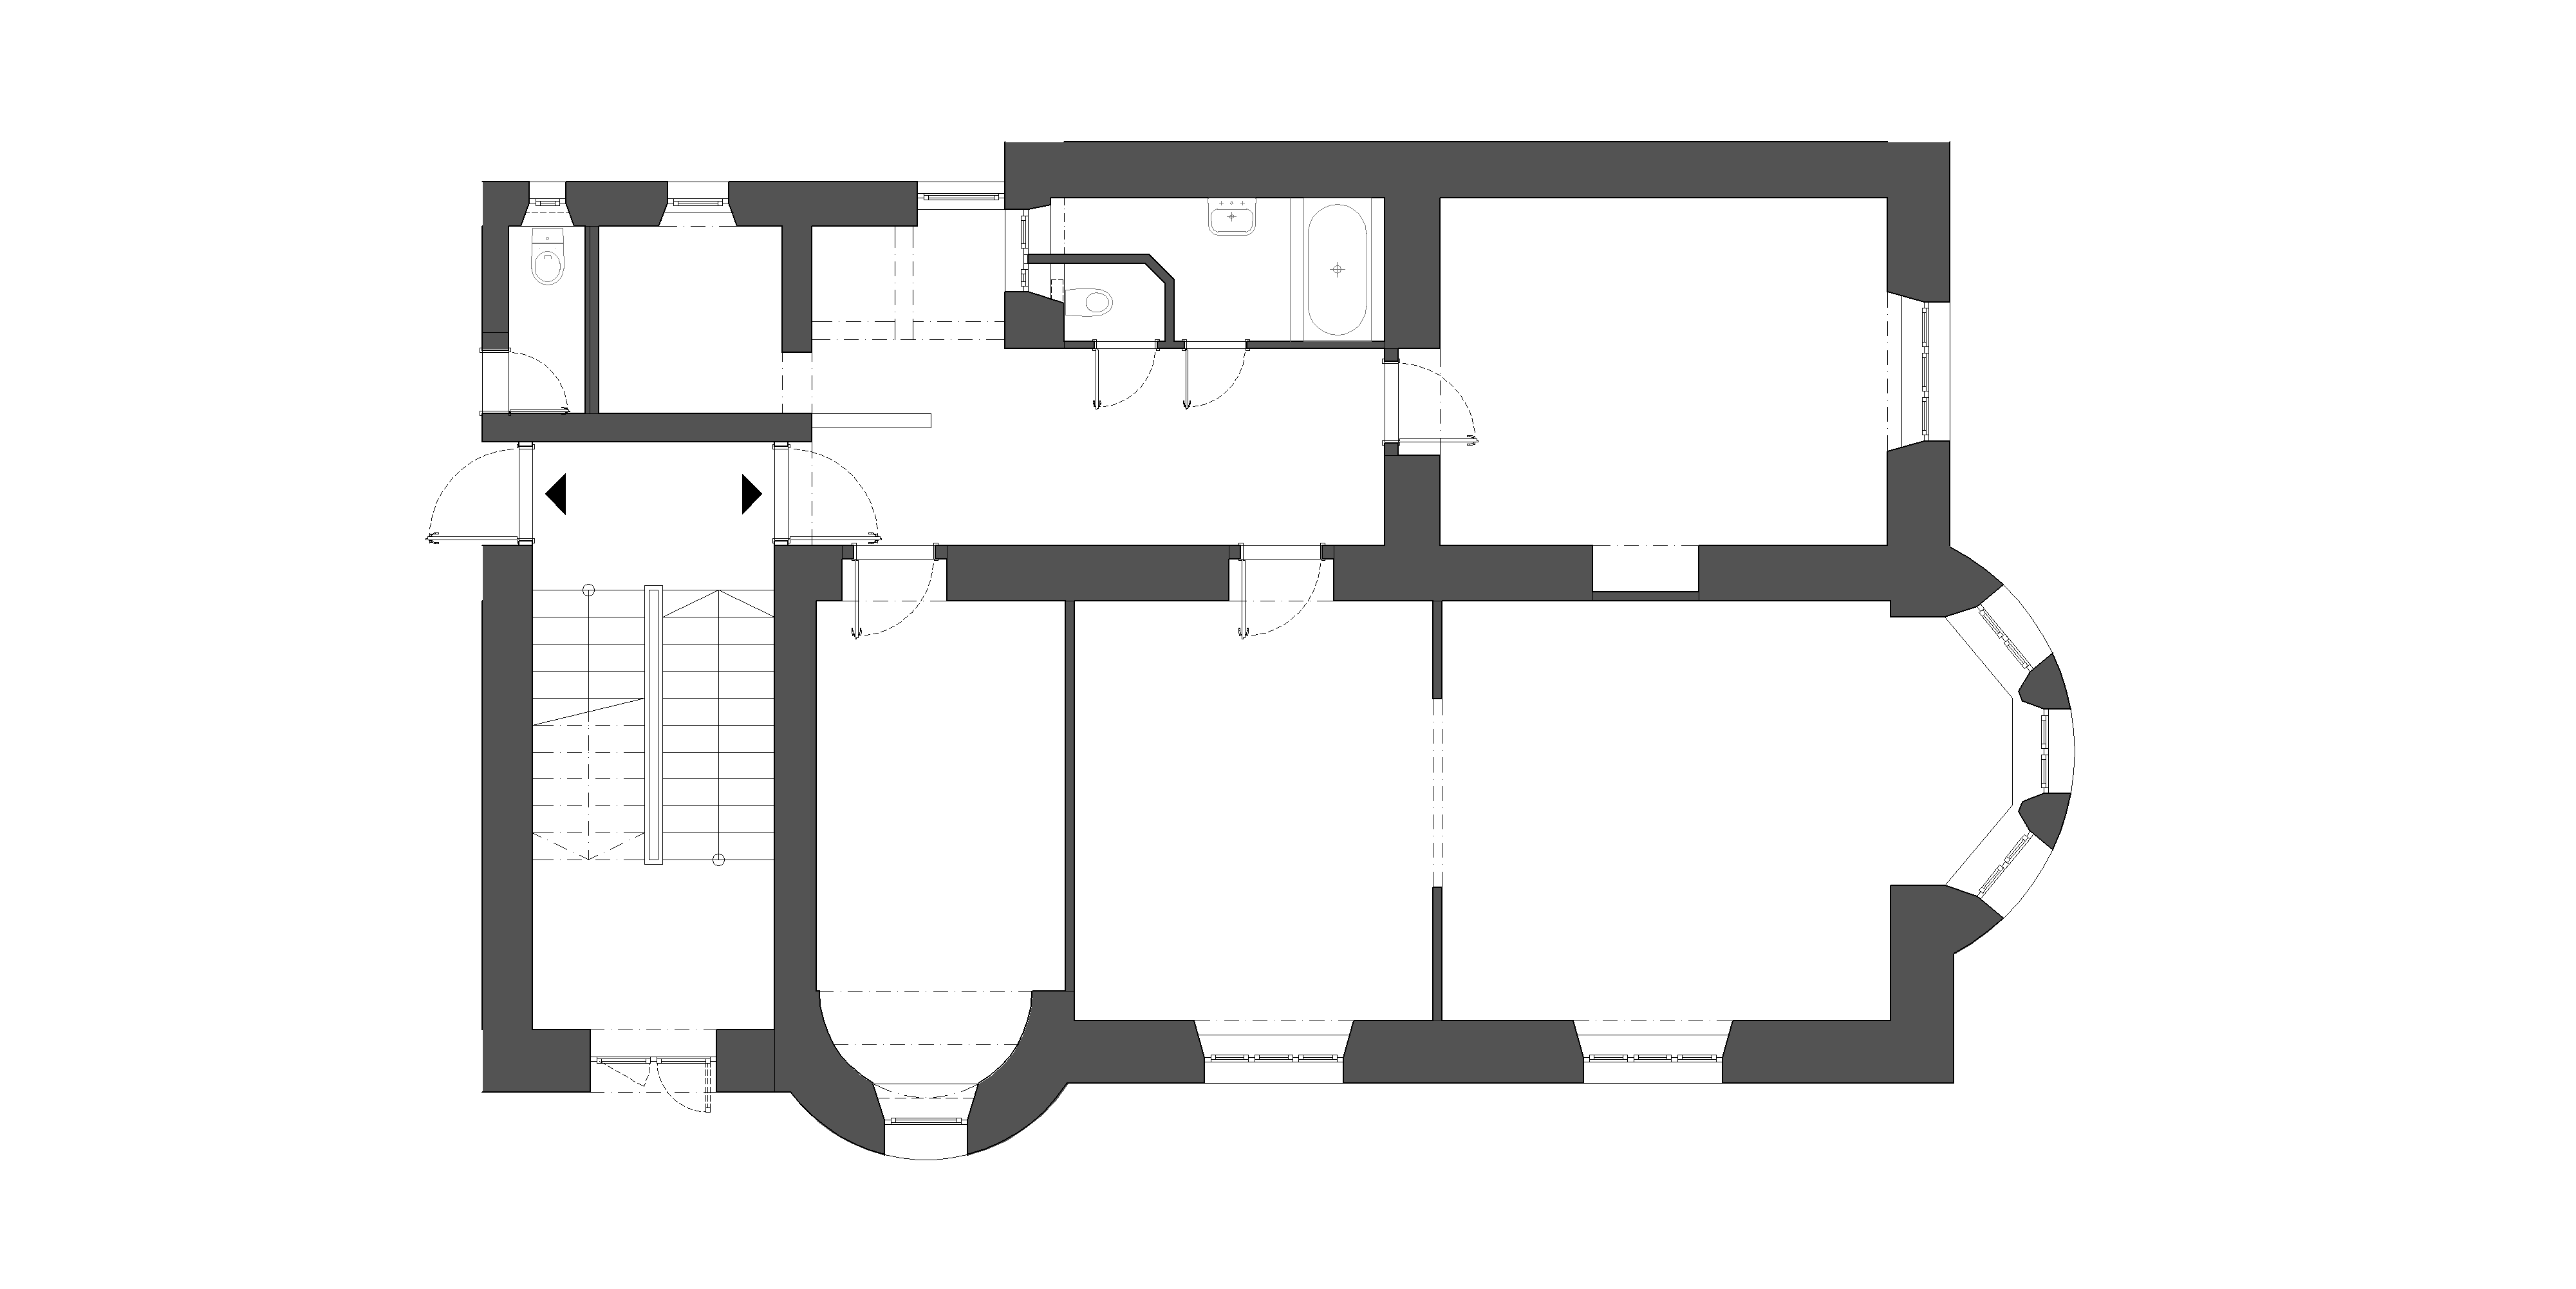 interier-bytu-rekonstrukcia-palisady-Bratislava-podorys-02-povodny-stav-svieza-dispozicia